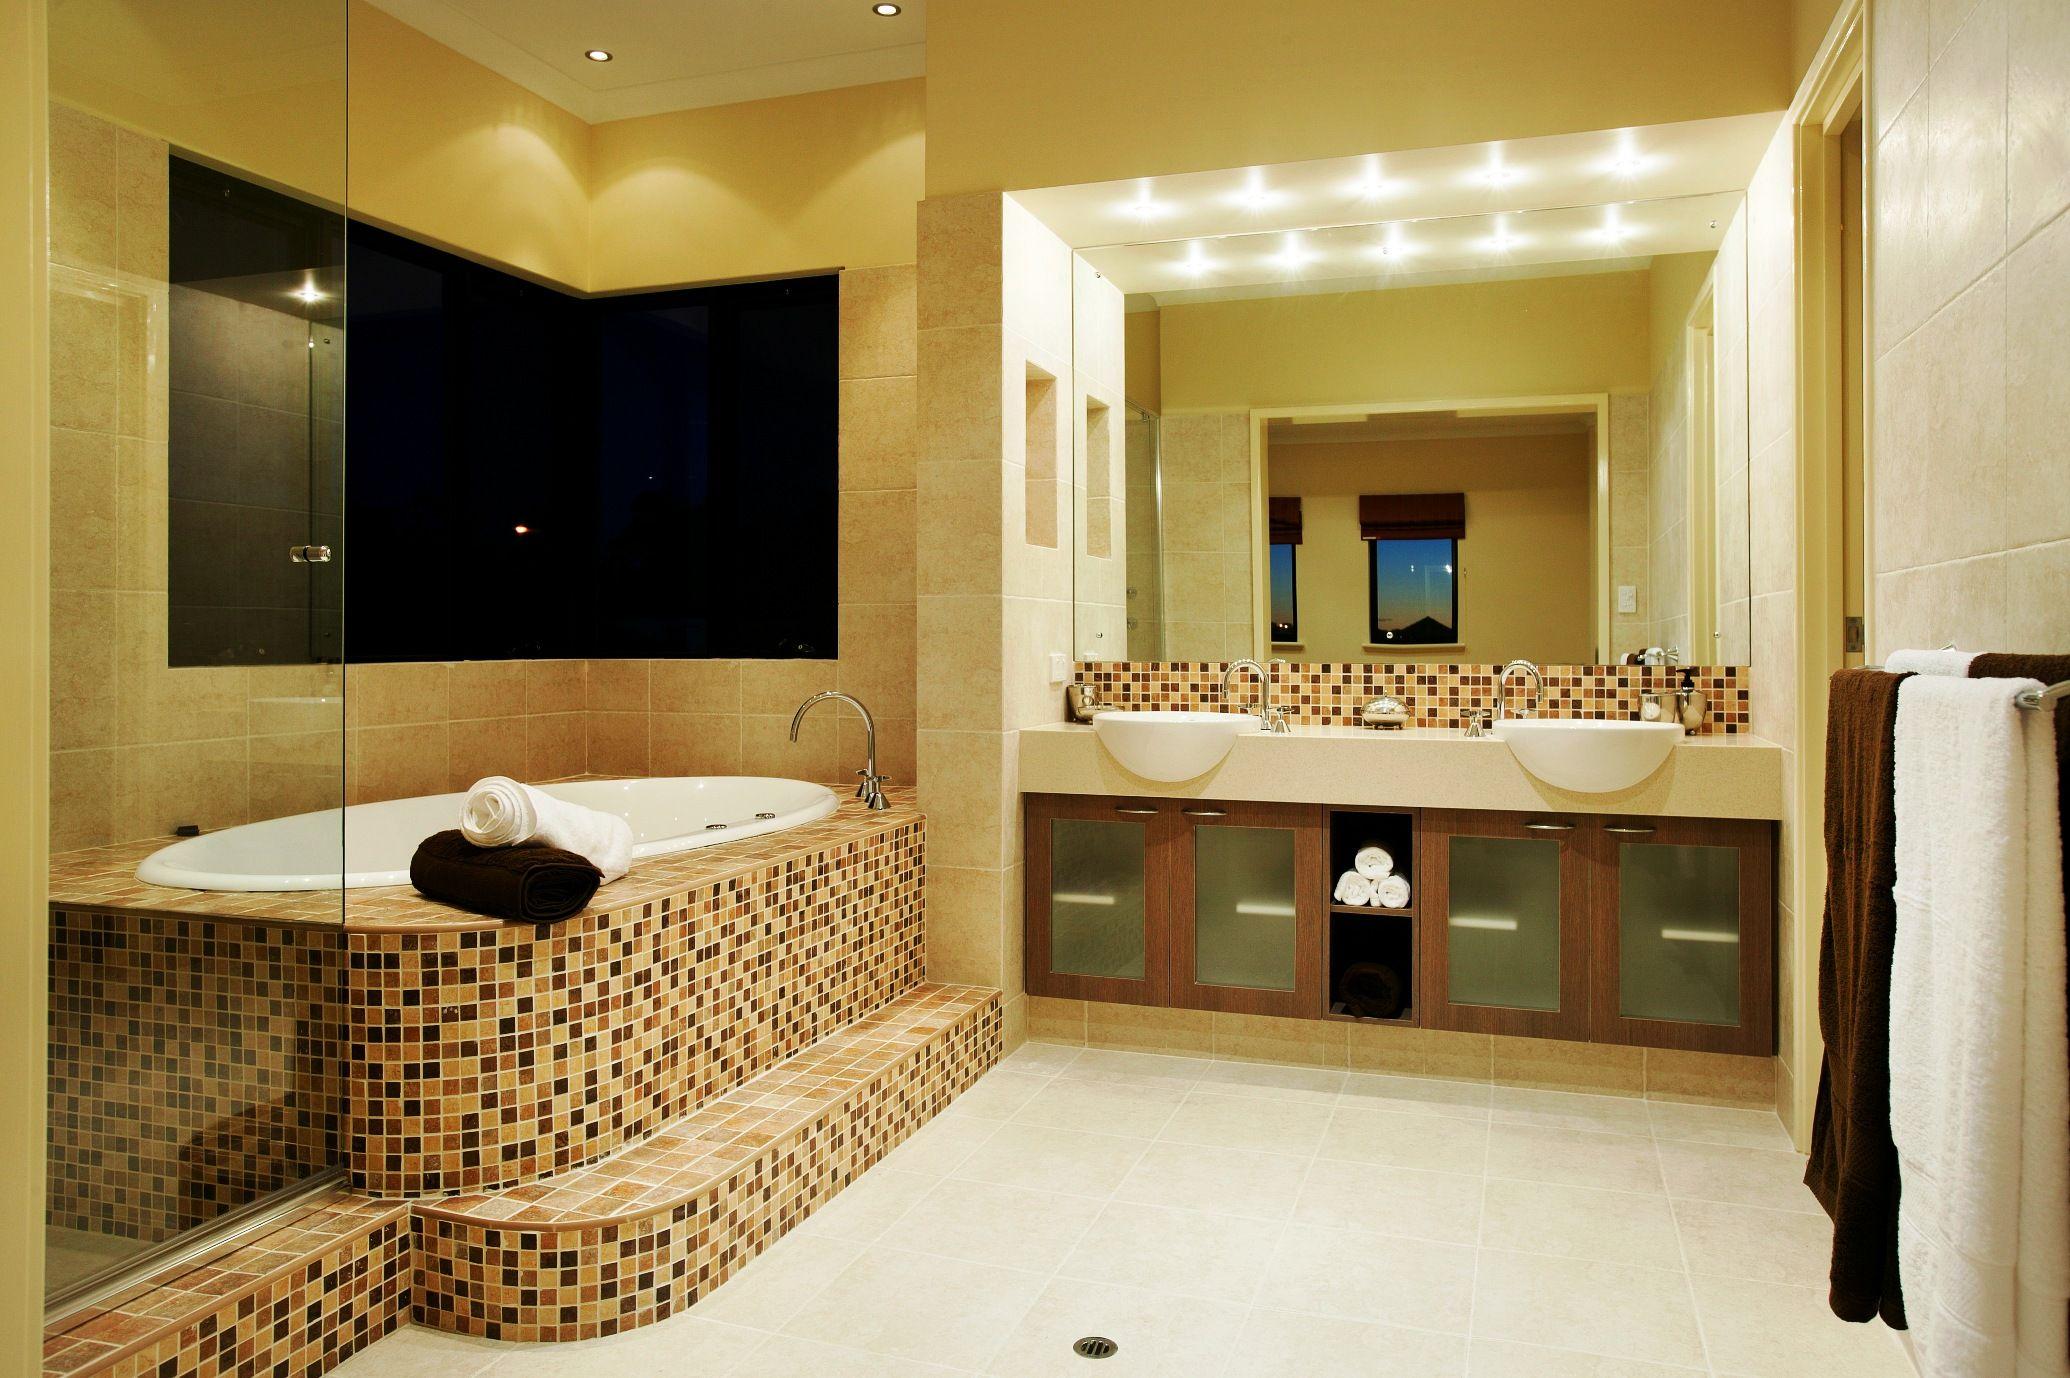 Kitchen Interior Design | ... Interior Design Perth - Interior Design Perth - Kitchen Design Perth